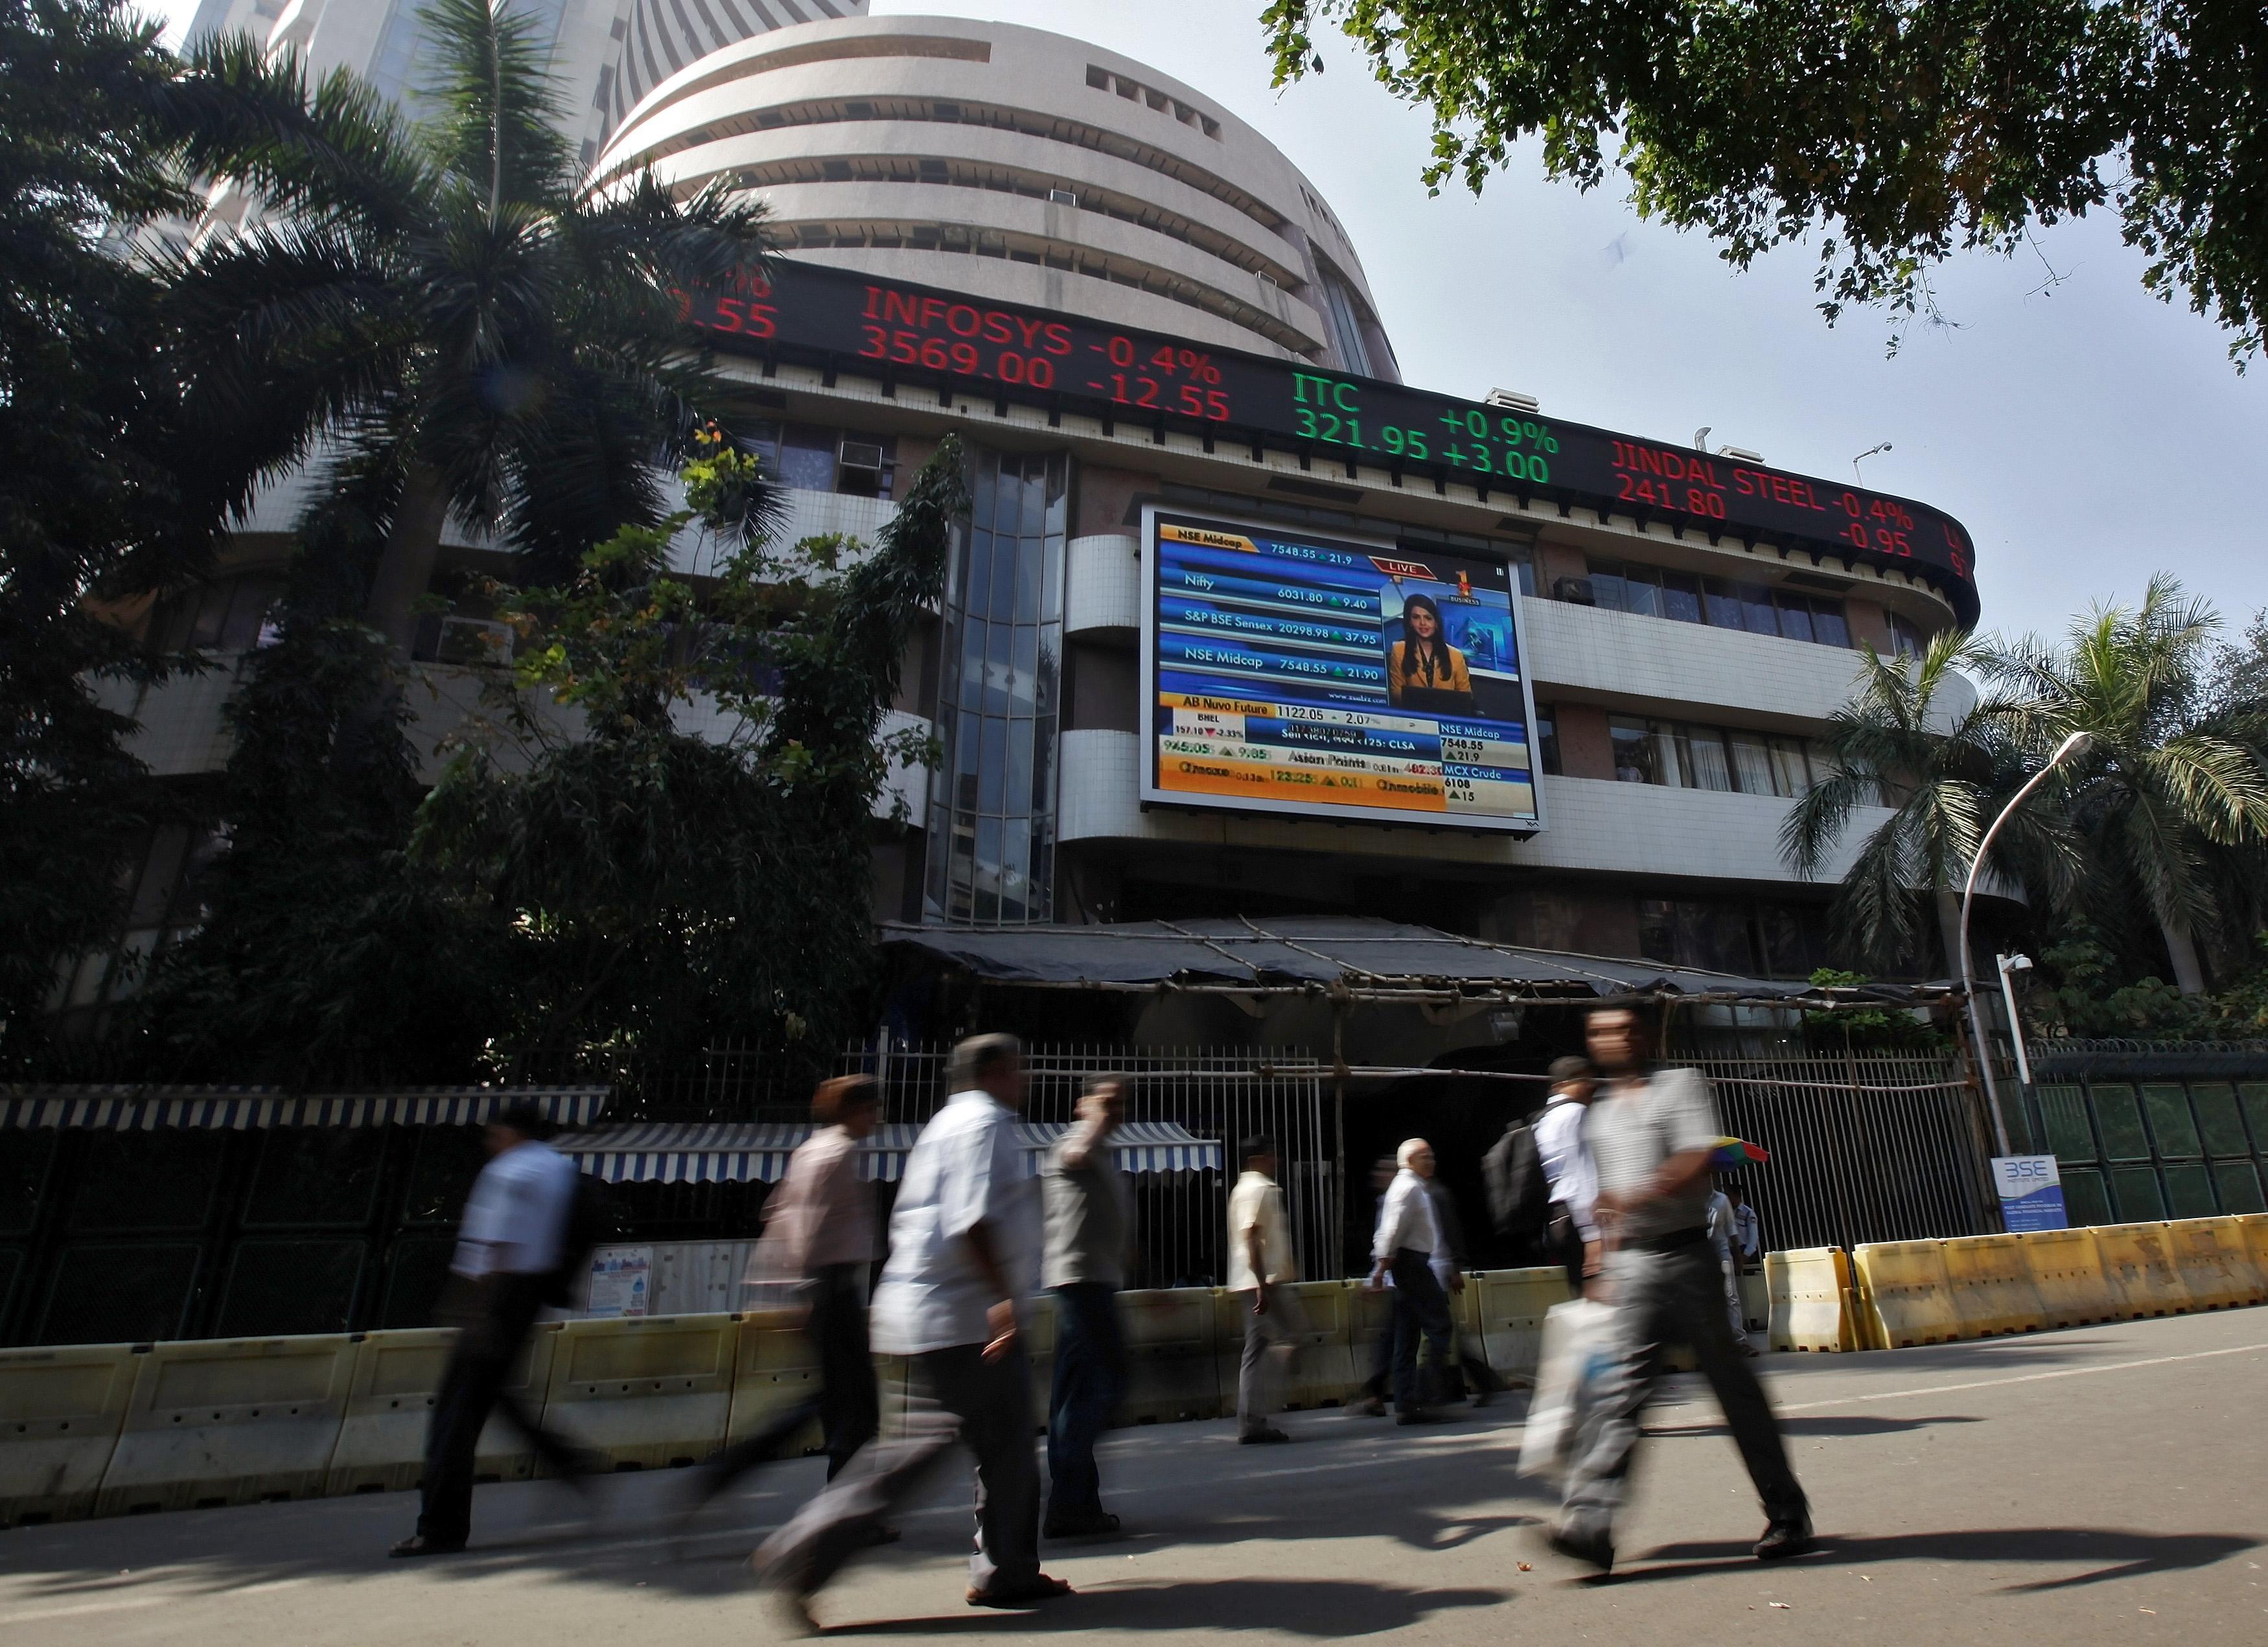 Sensex slides further, Nifty ends below sensitive 8,000 mark